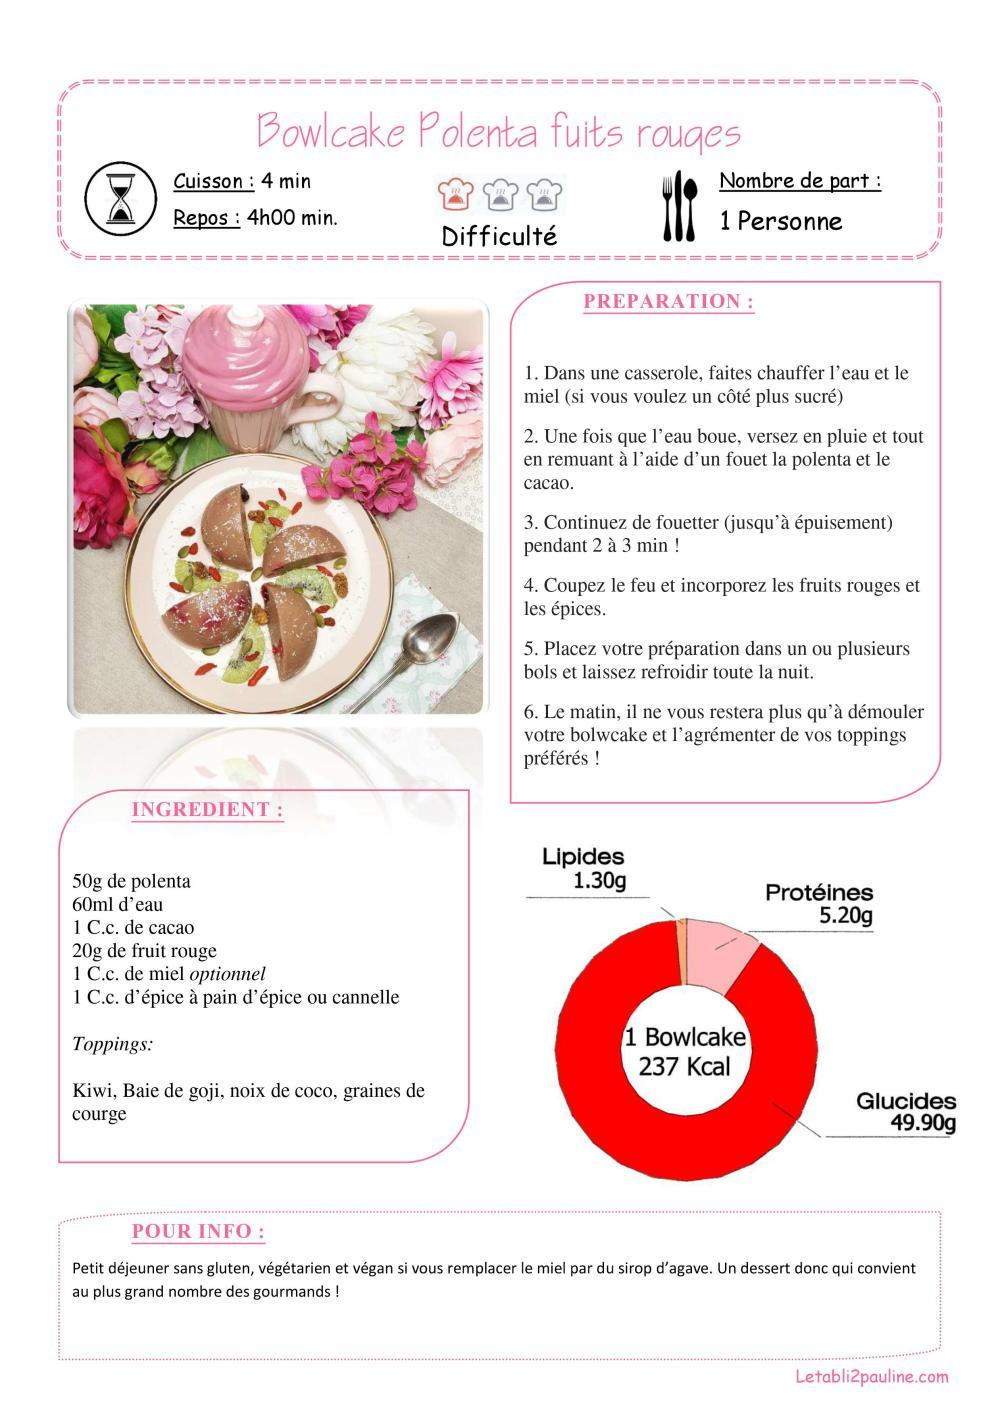 Bowlcake polenta - chocolat -Fruit rouge